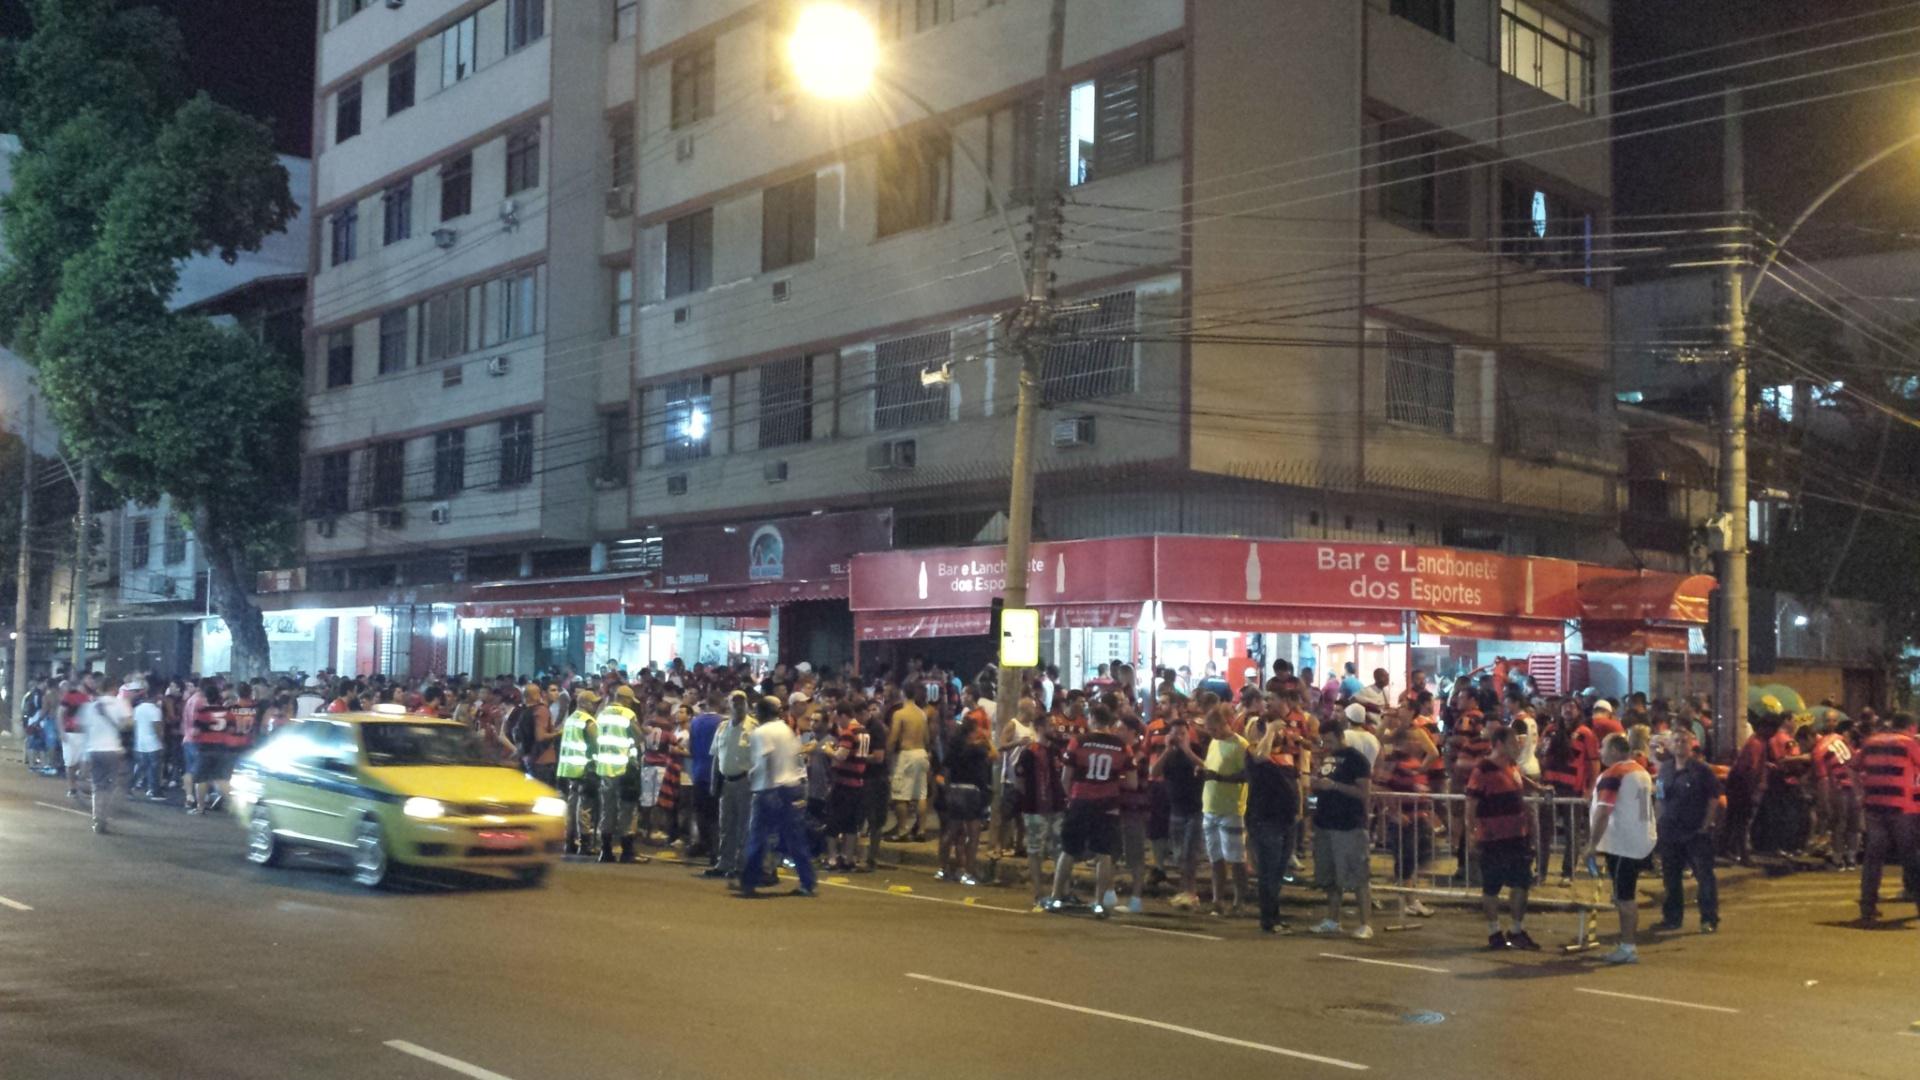 09.04.2014 - Chegada dos flamenguistas ao Maracanã para a partida contra o León, pela Libertadores, foi marcada com nó no trânsito, reboque e cambistas: